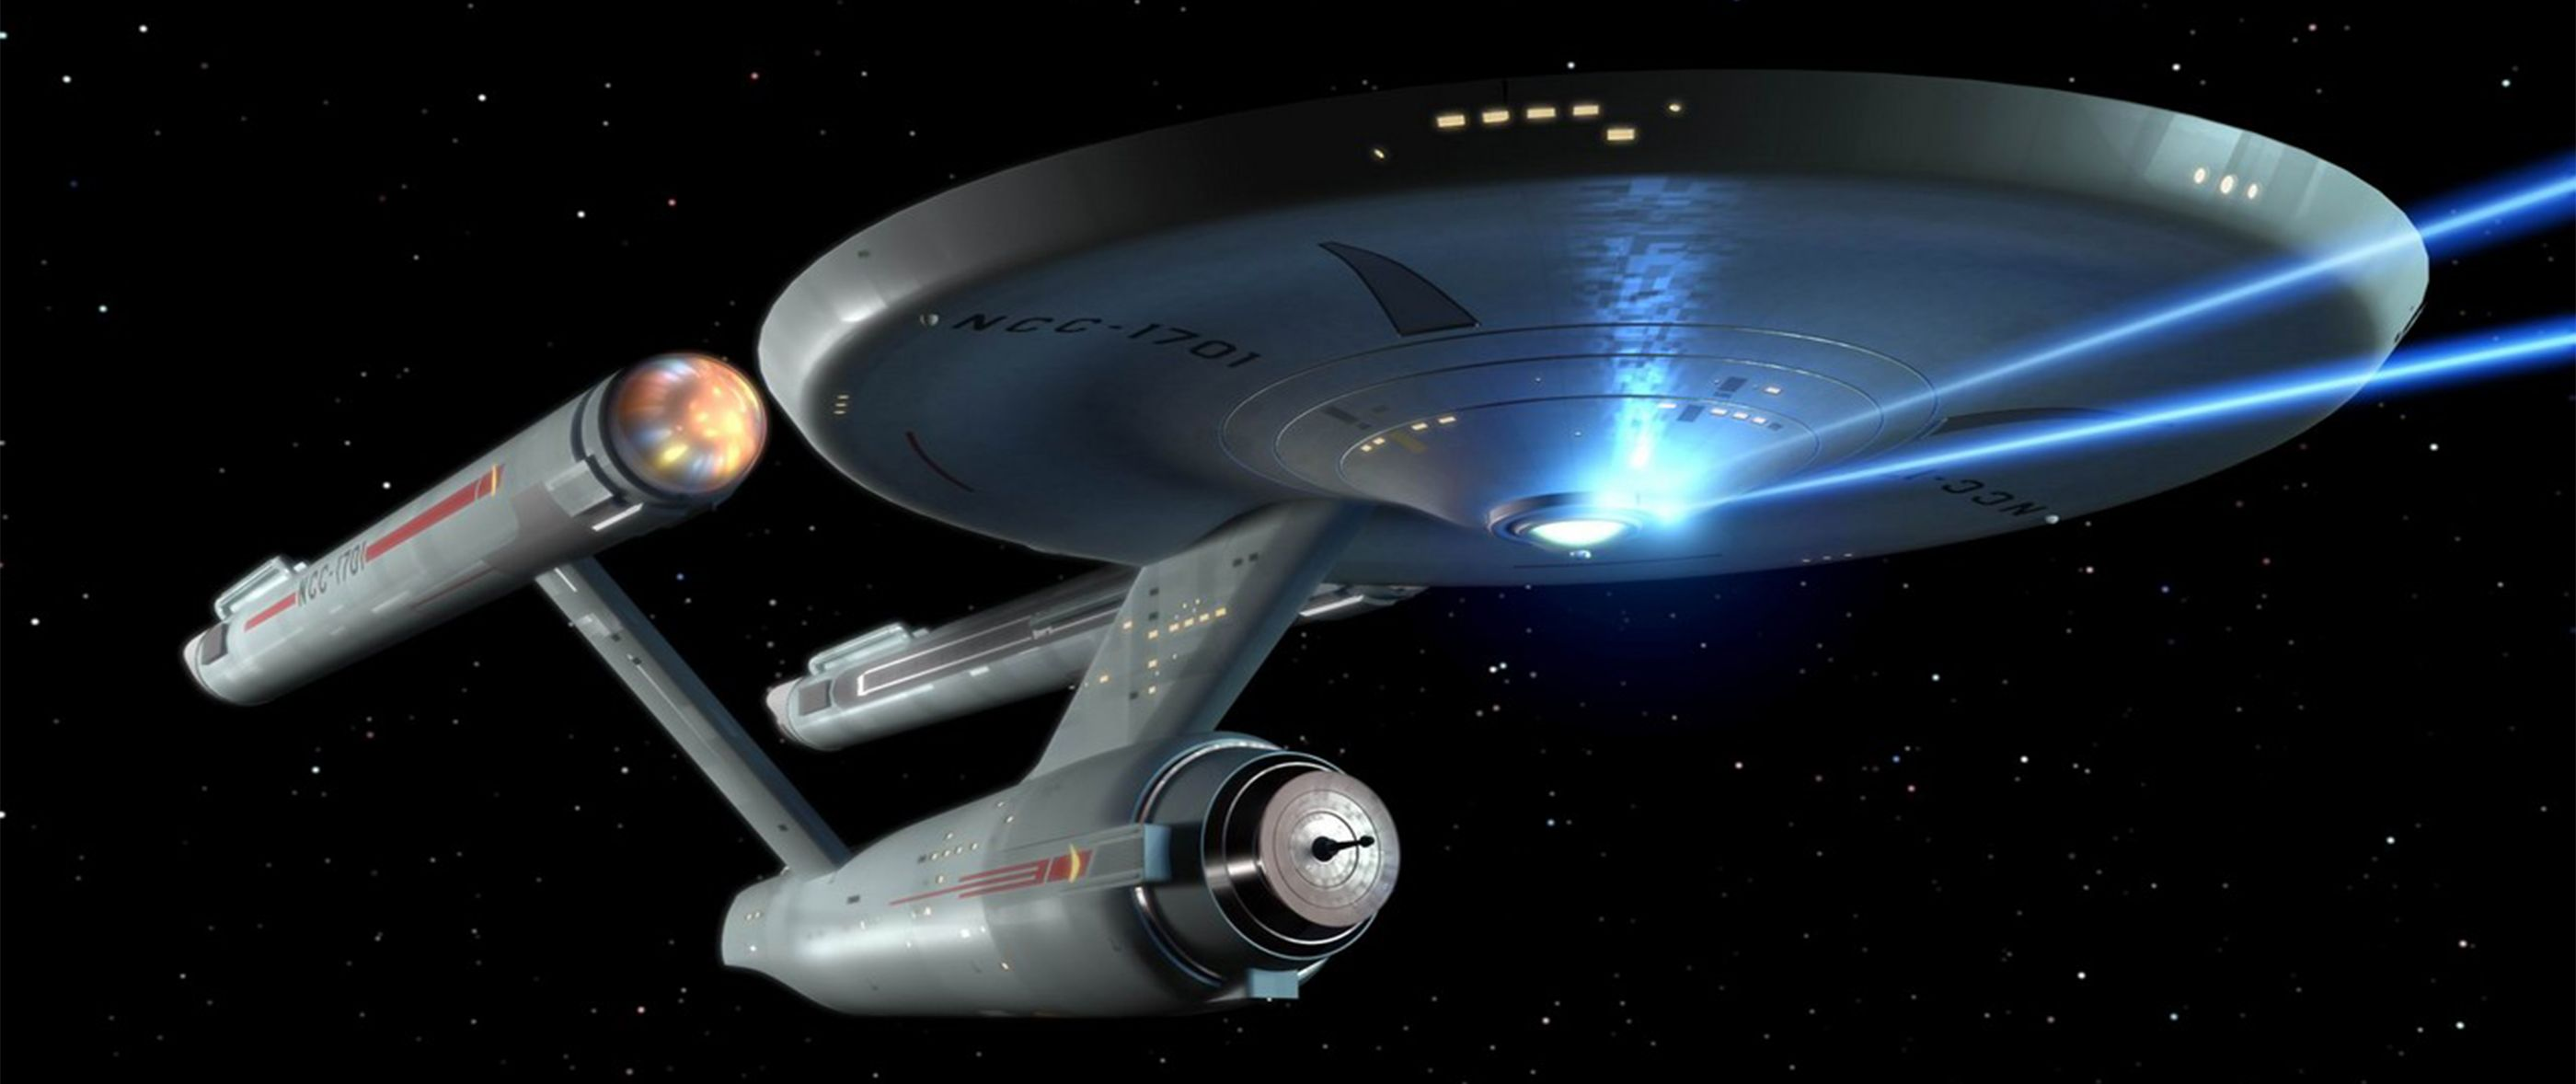 Uss enterprise ncc 1701 d galaxy class saucer separation r flickr - Star Trek Brighten The Galaxy With Enterprise Led Light